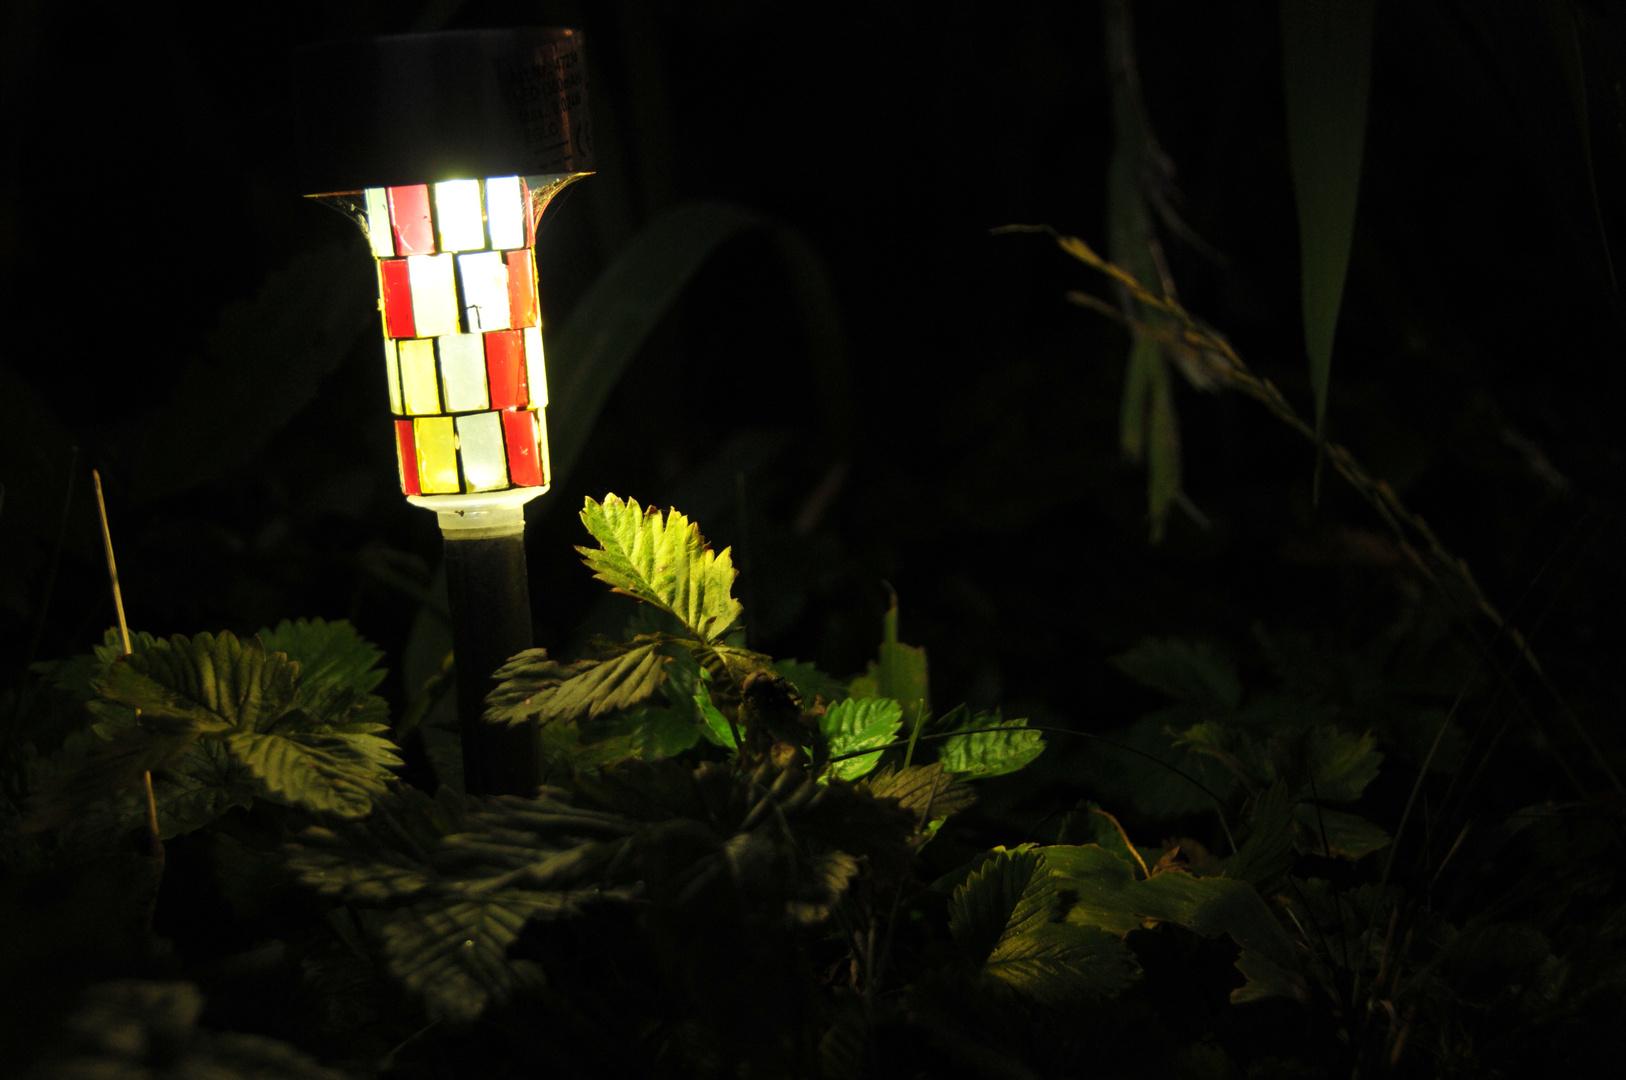 This little Light...